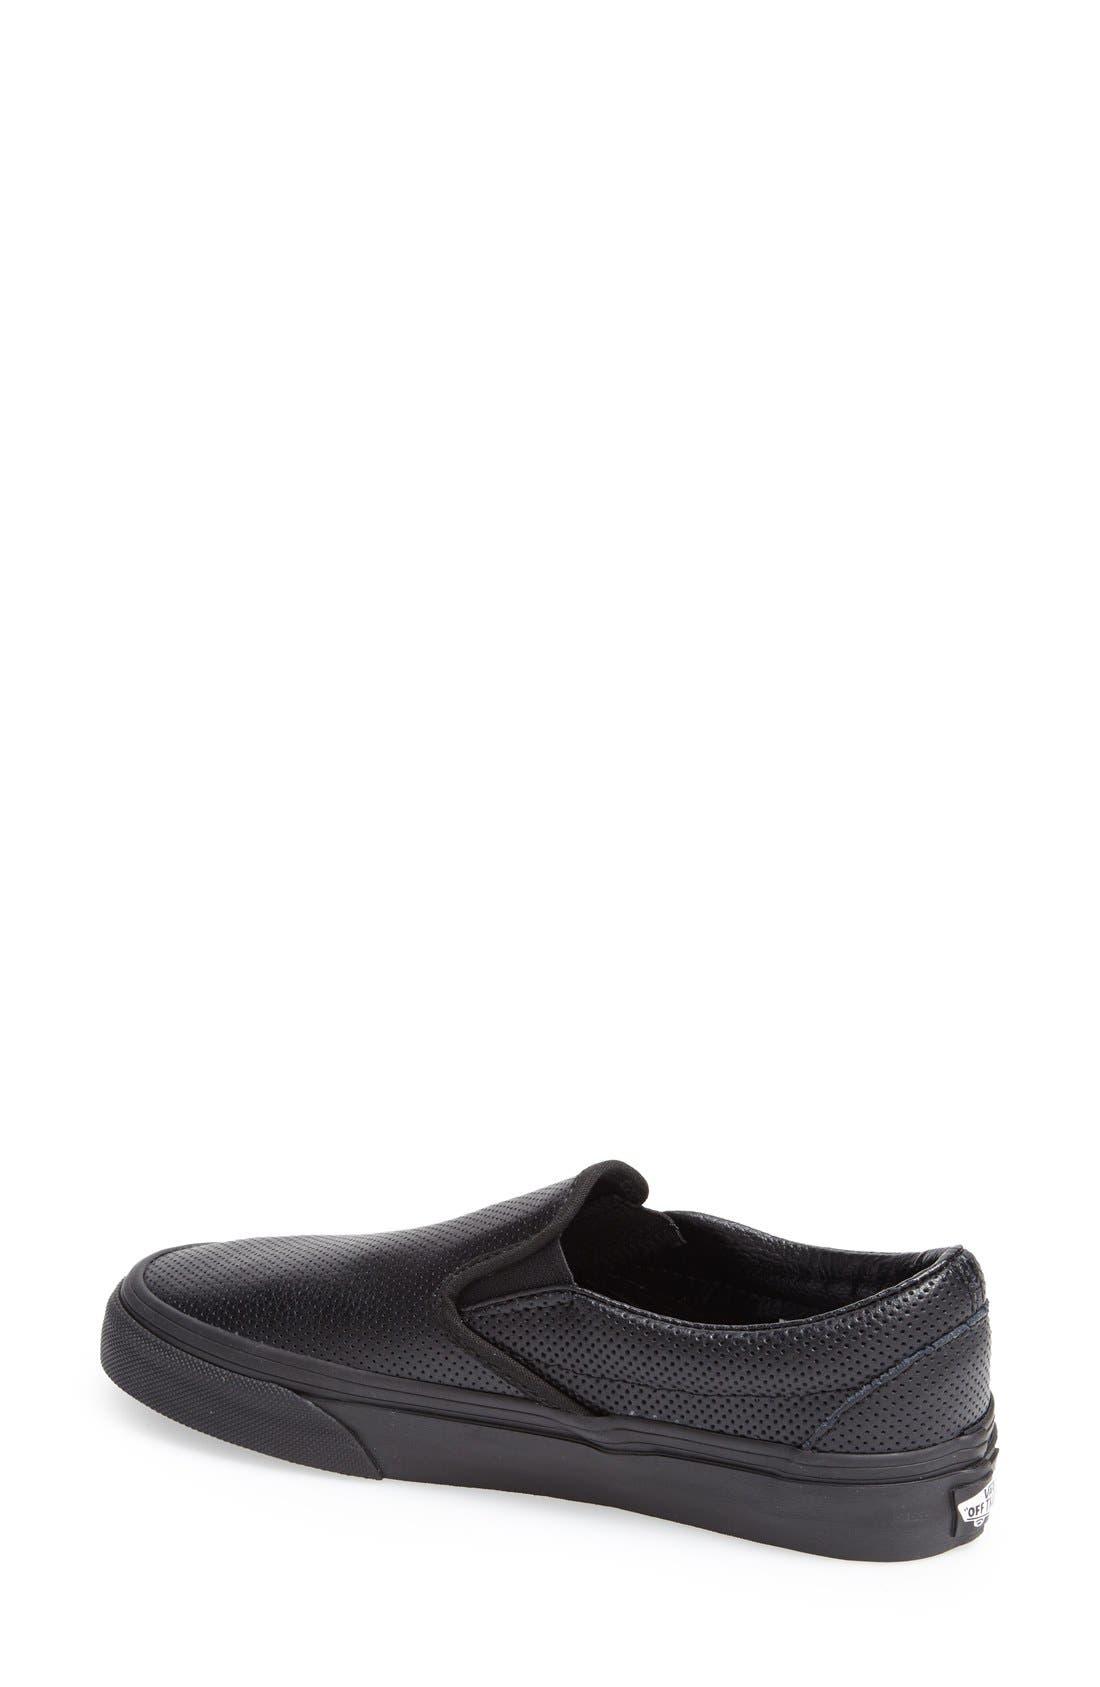 Alternate Image 2  - Vans 'Classic - Perforated' Slip-On Sneaker (Women)